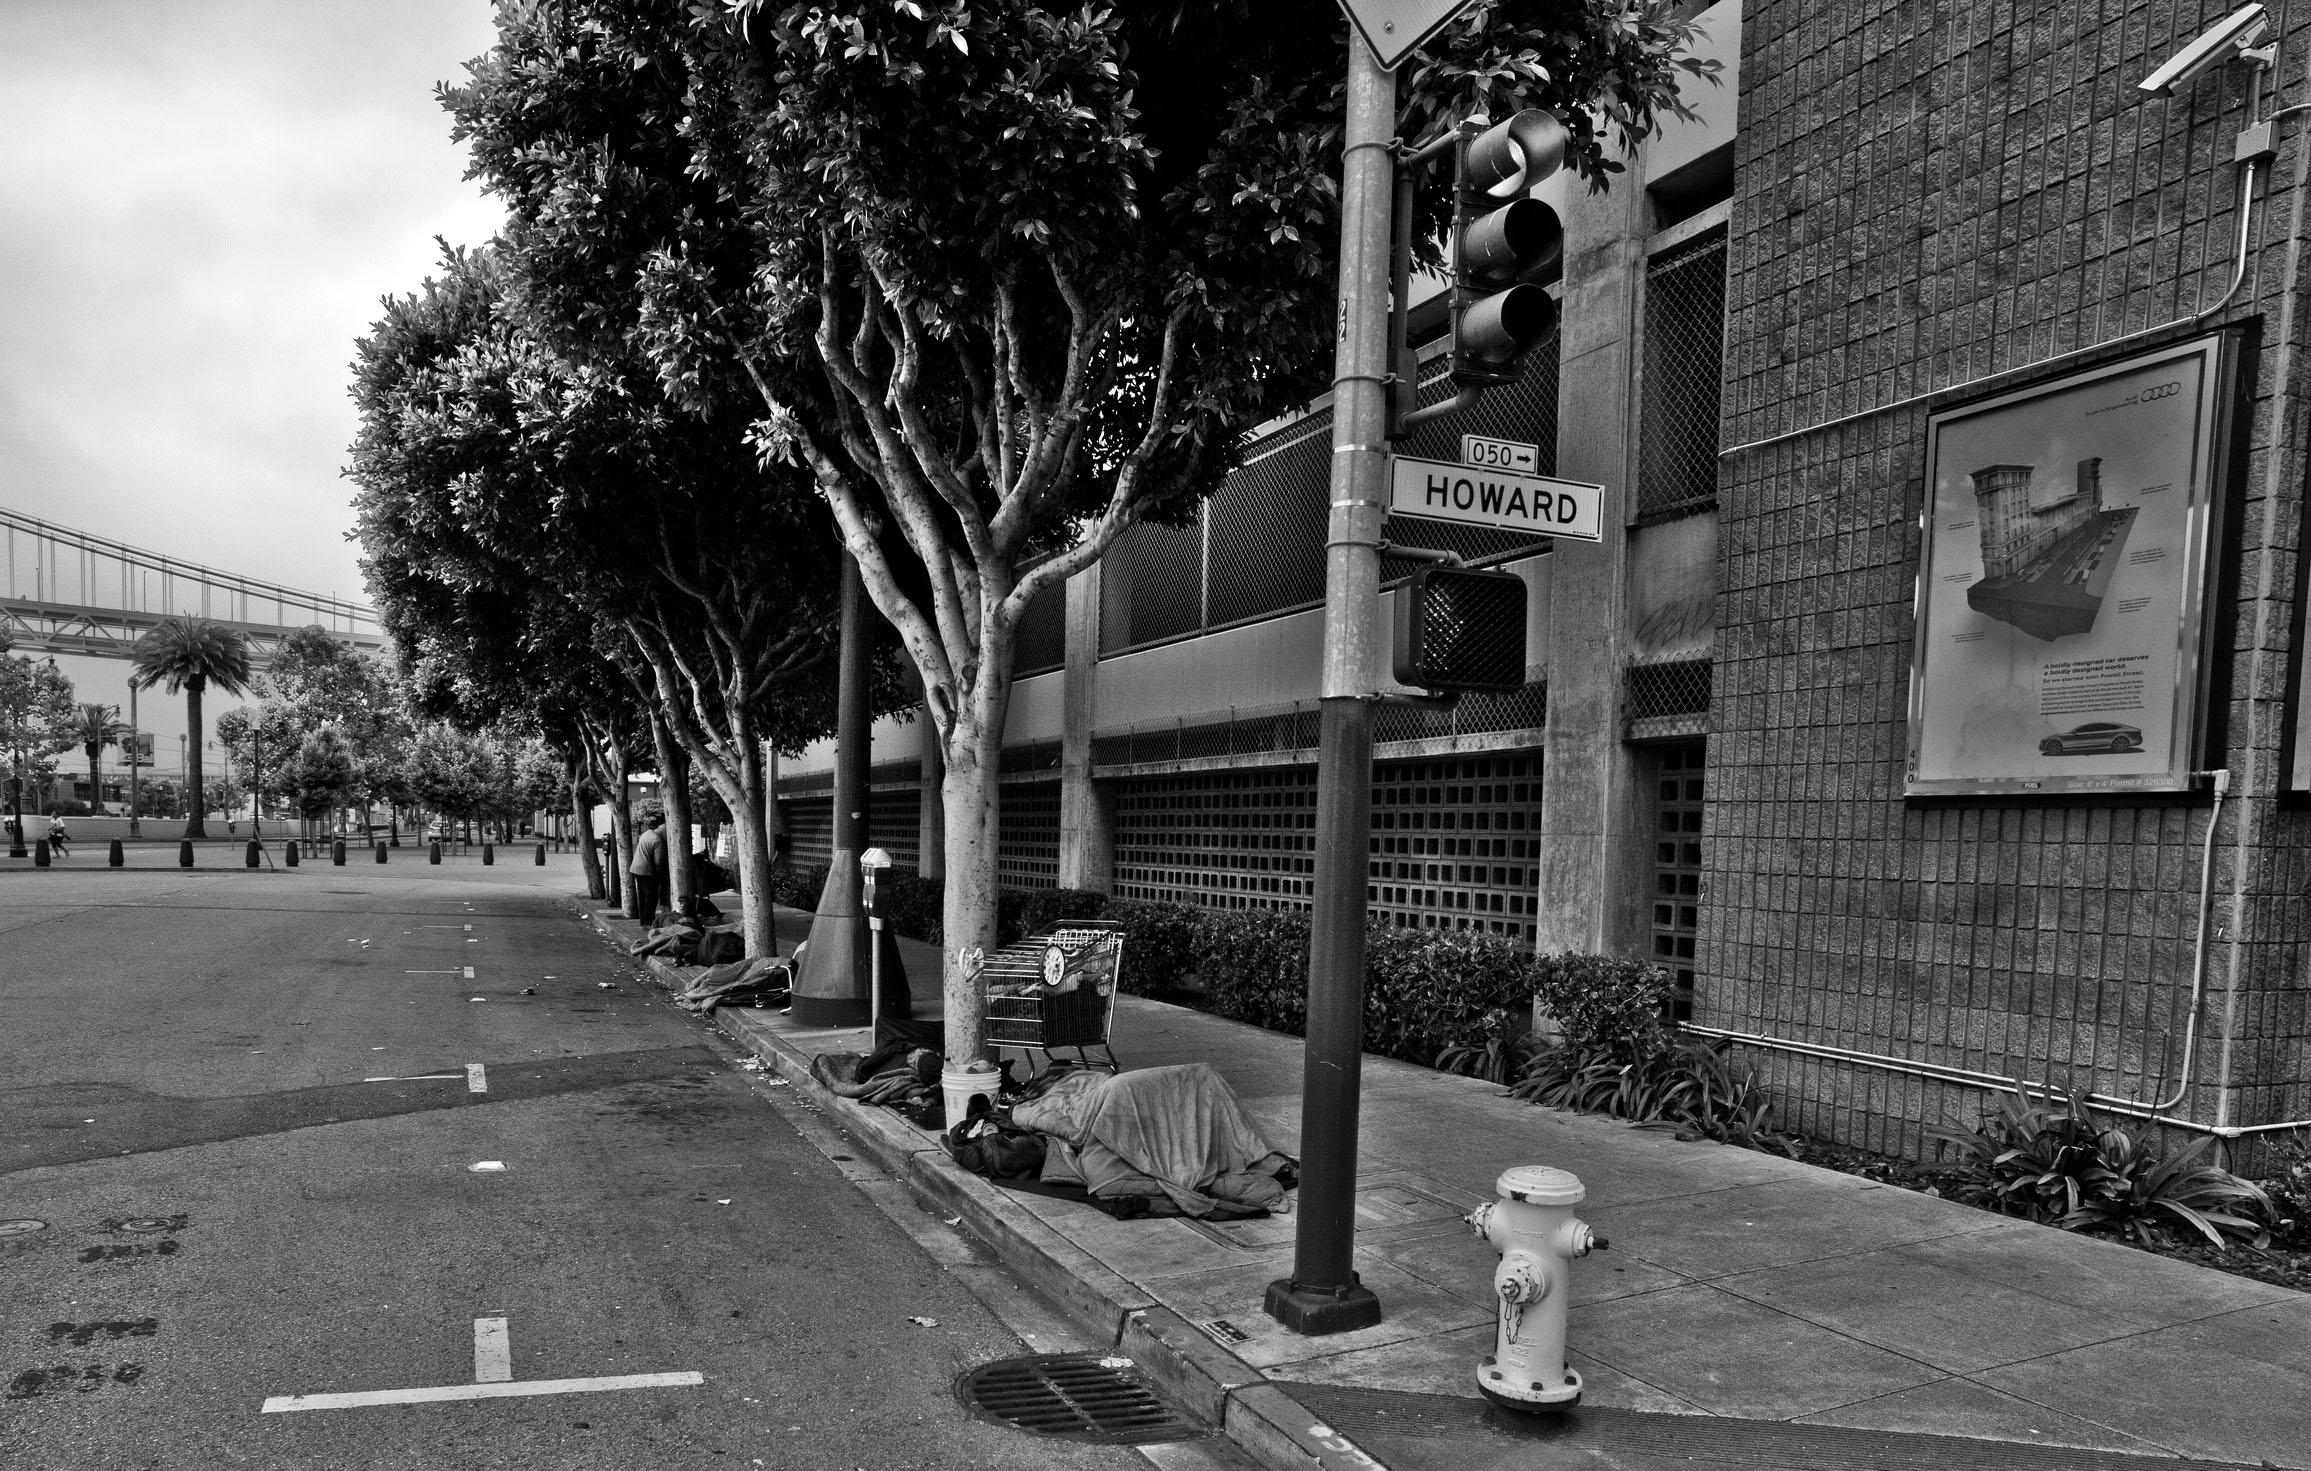 Architecture Harris St homeless San Francisco CA July 2011 02